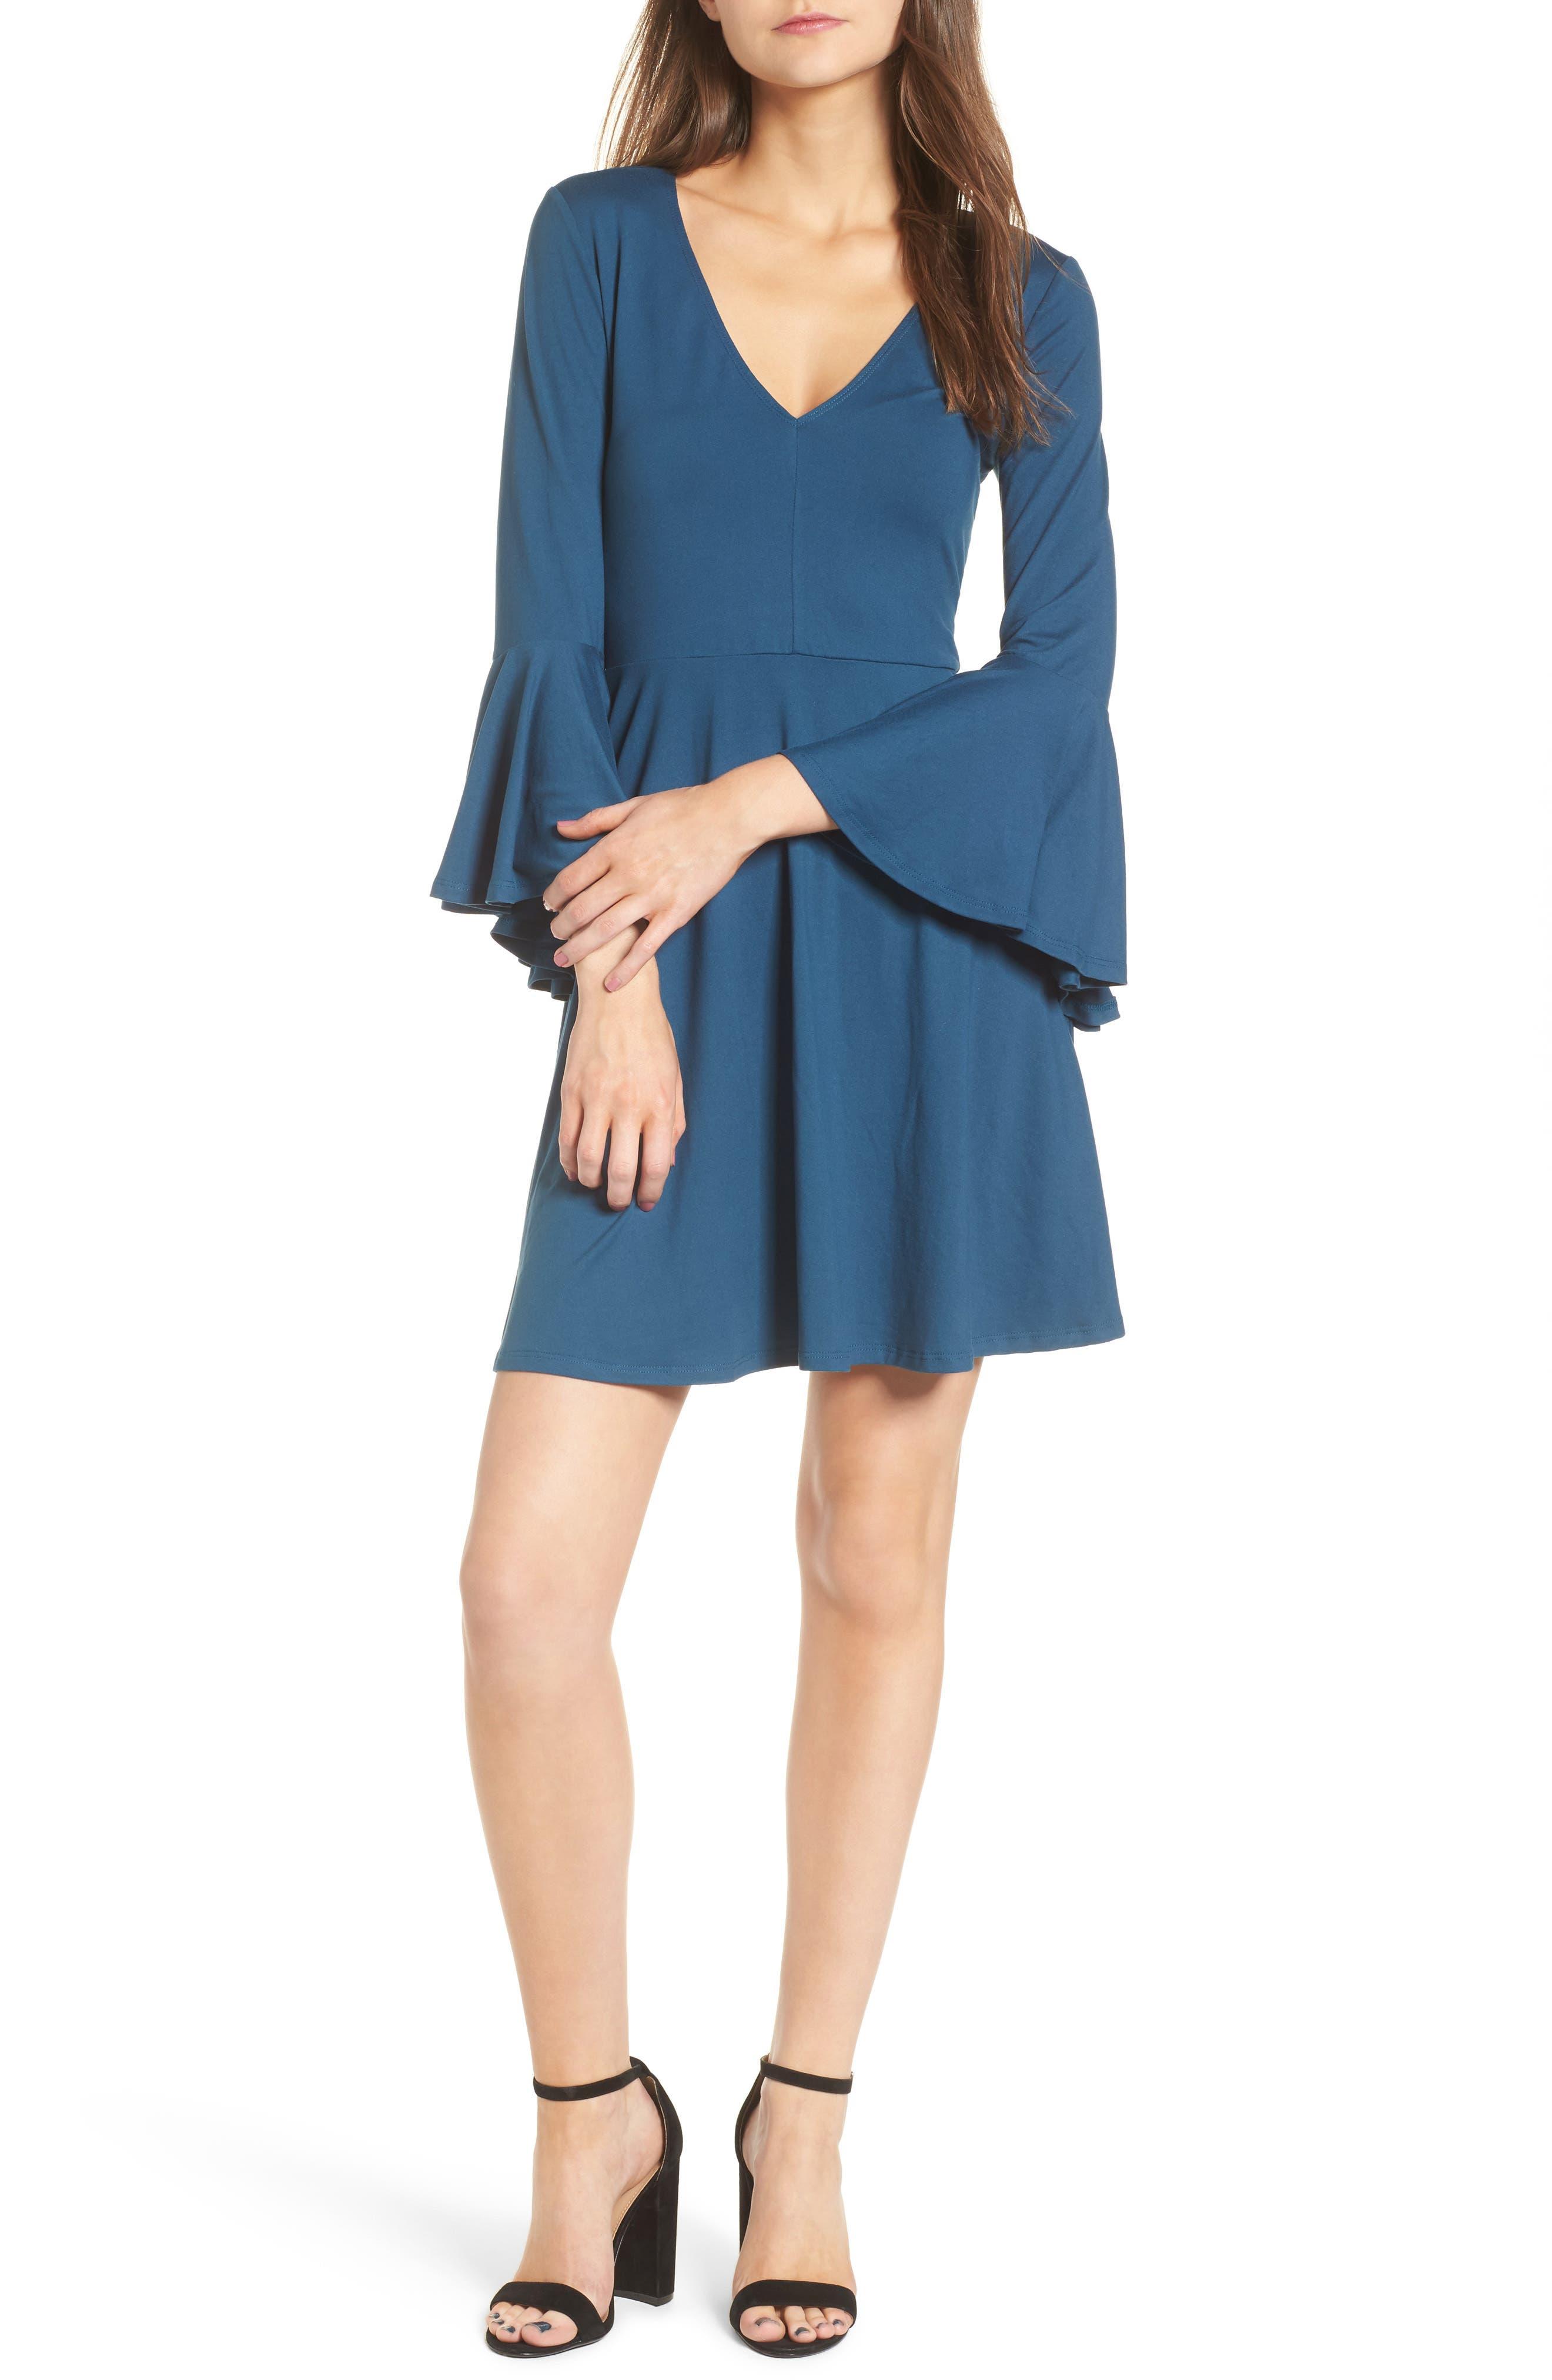 Socialite Bell Sleeve Knit Dress